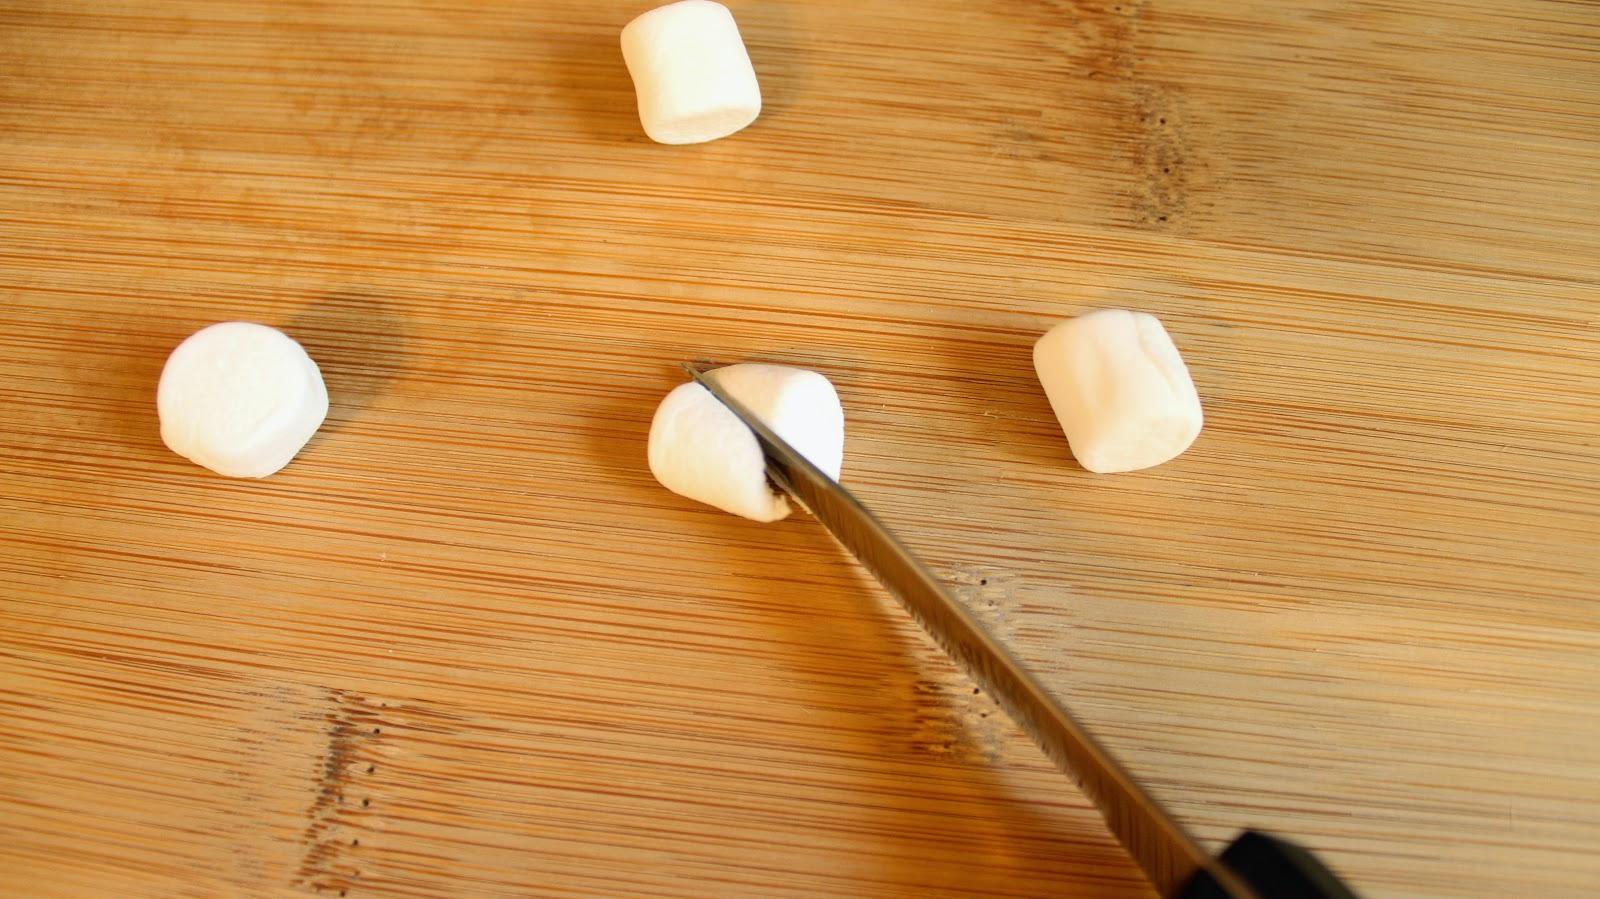 Knife cutting marshmallow